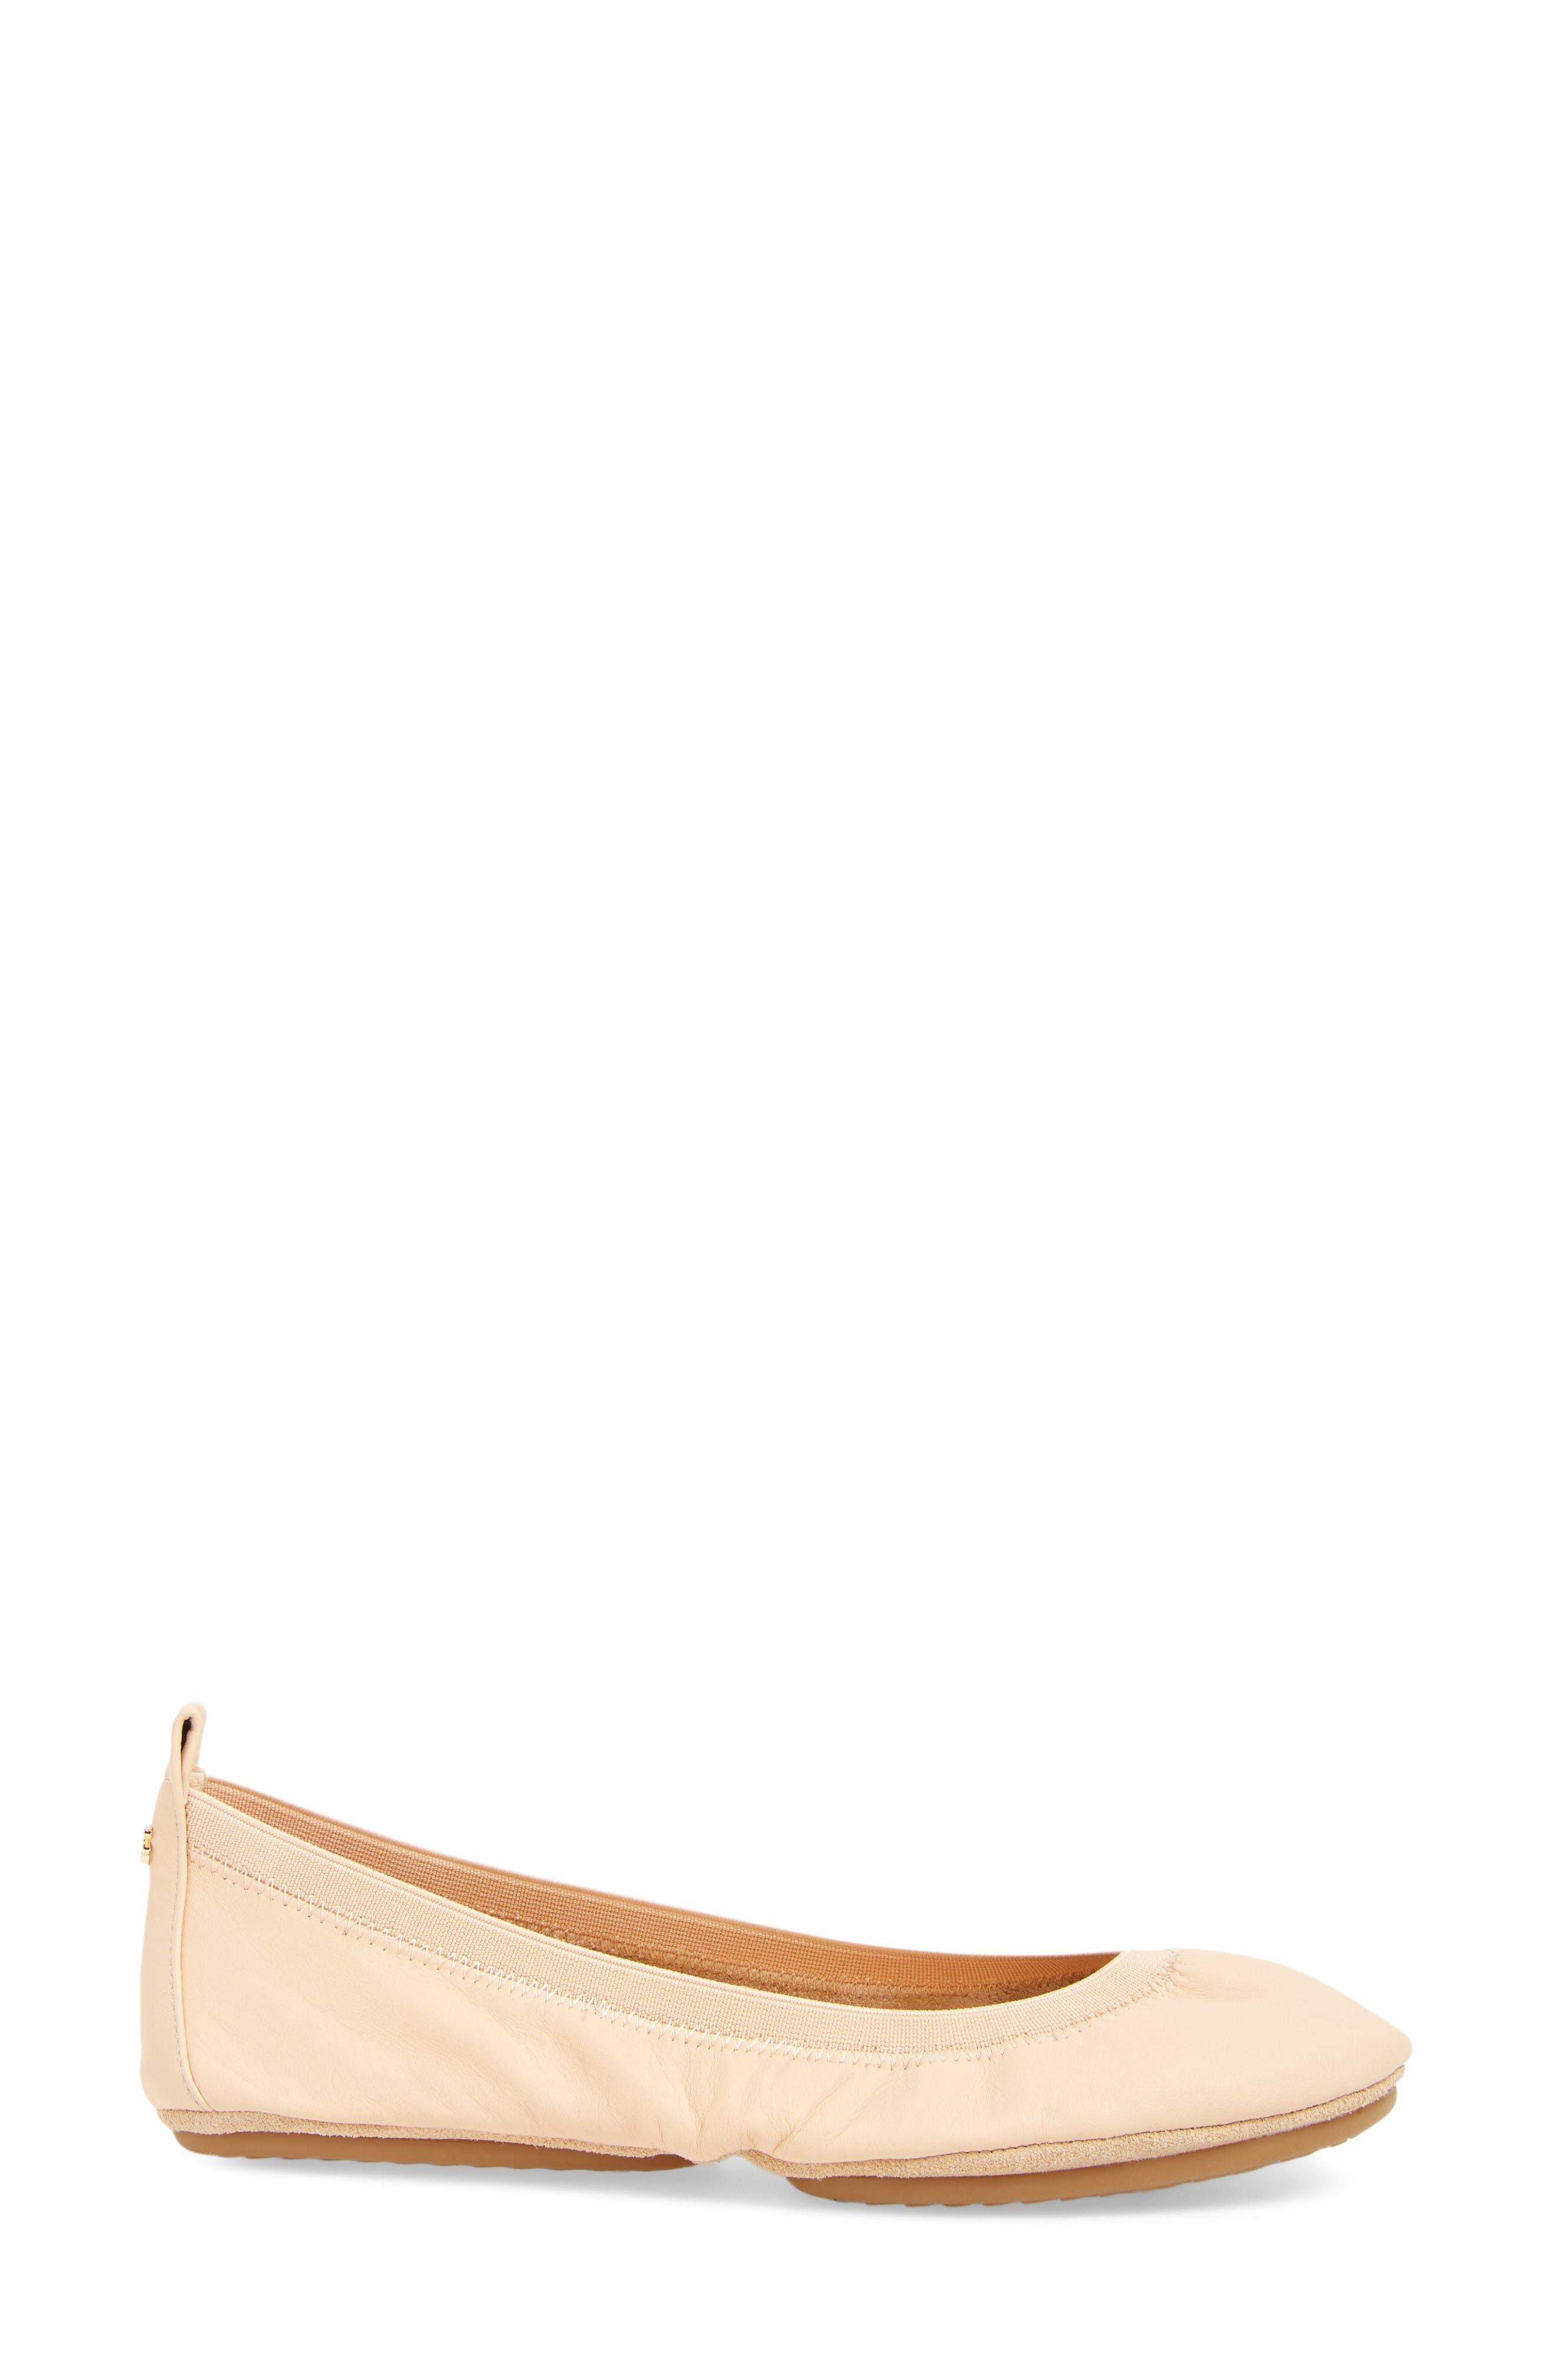 Samara Foldable Ballet Flat,                             Alternate thumbnail 3, color,                             Nude Leather